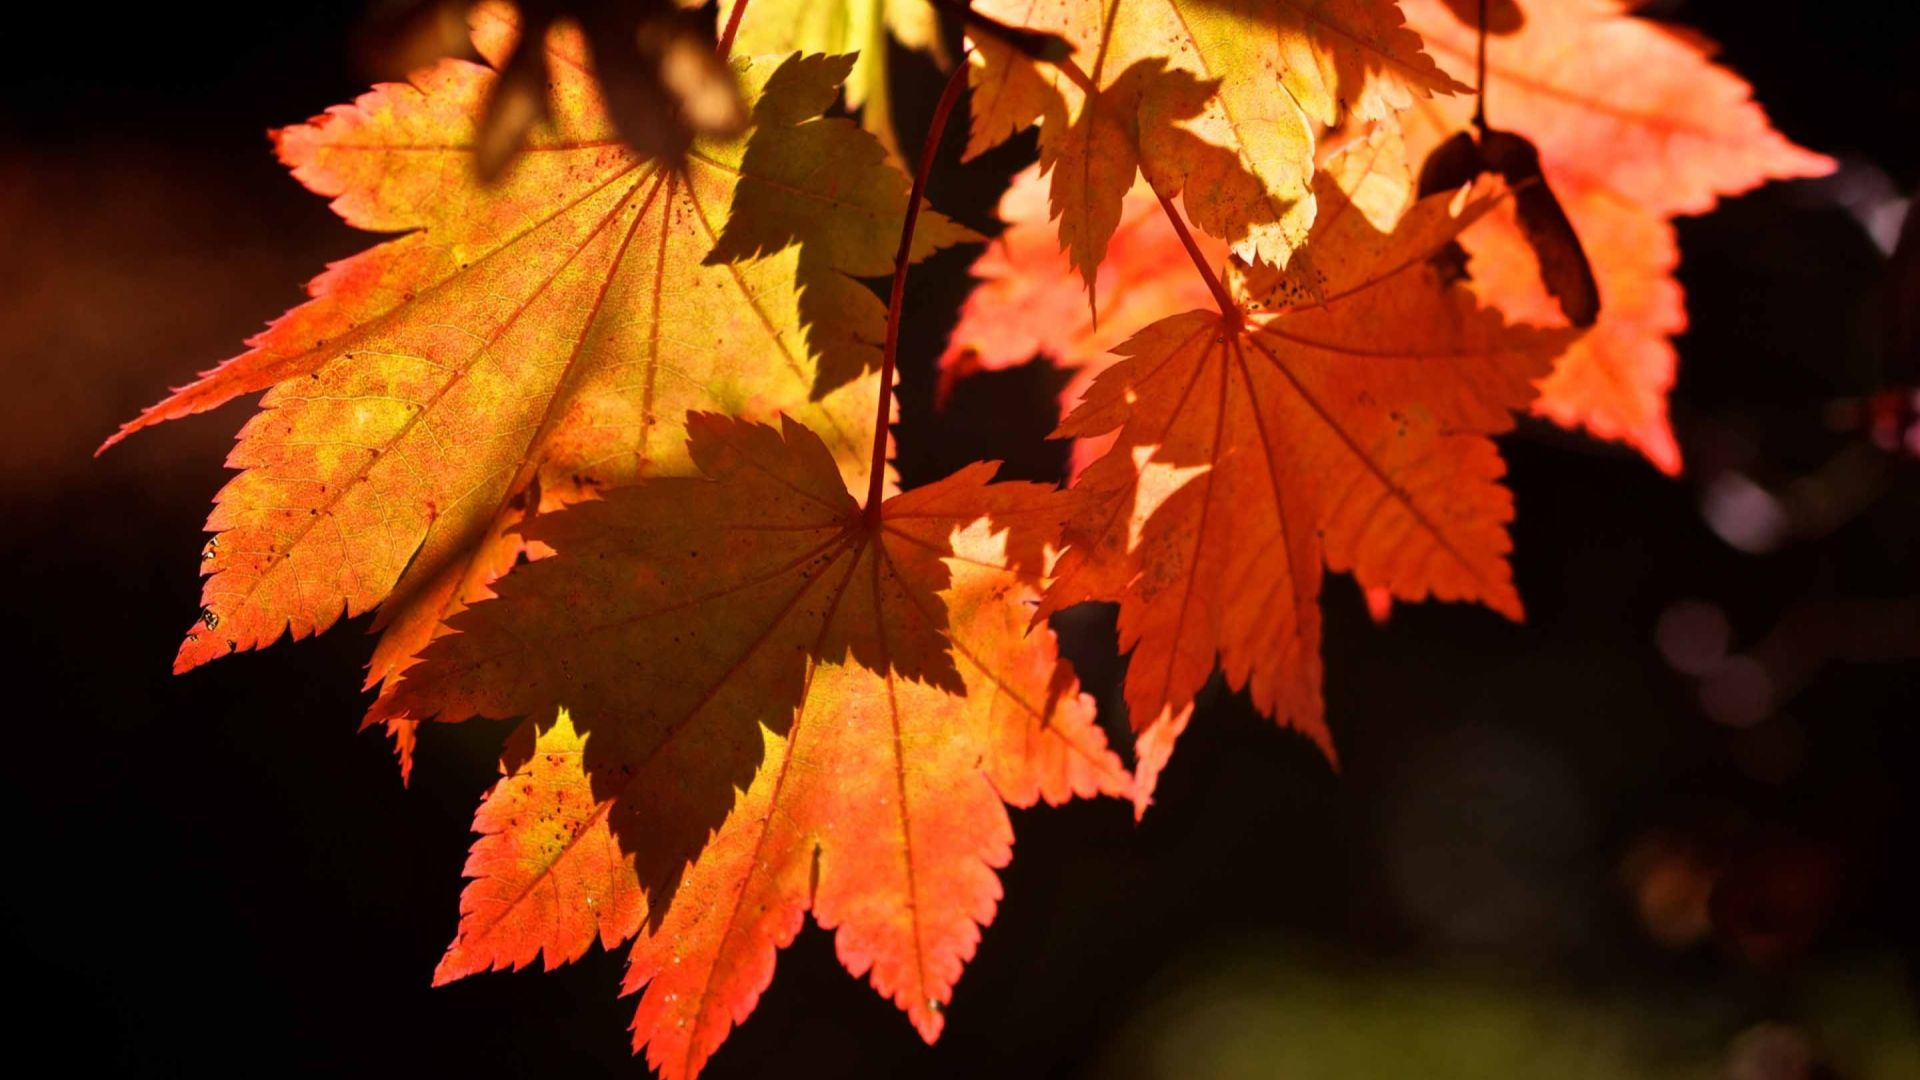 Foliage wallpaper download